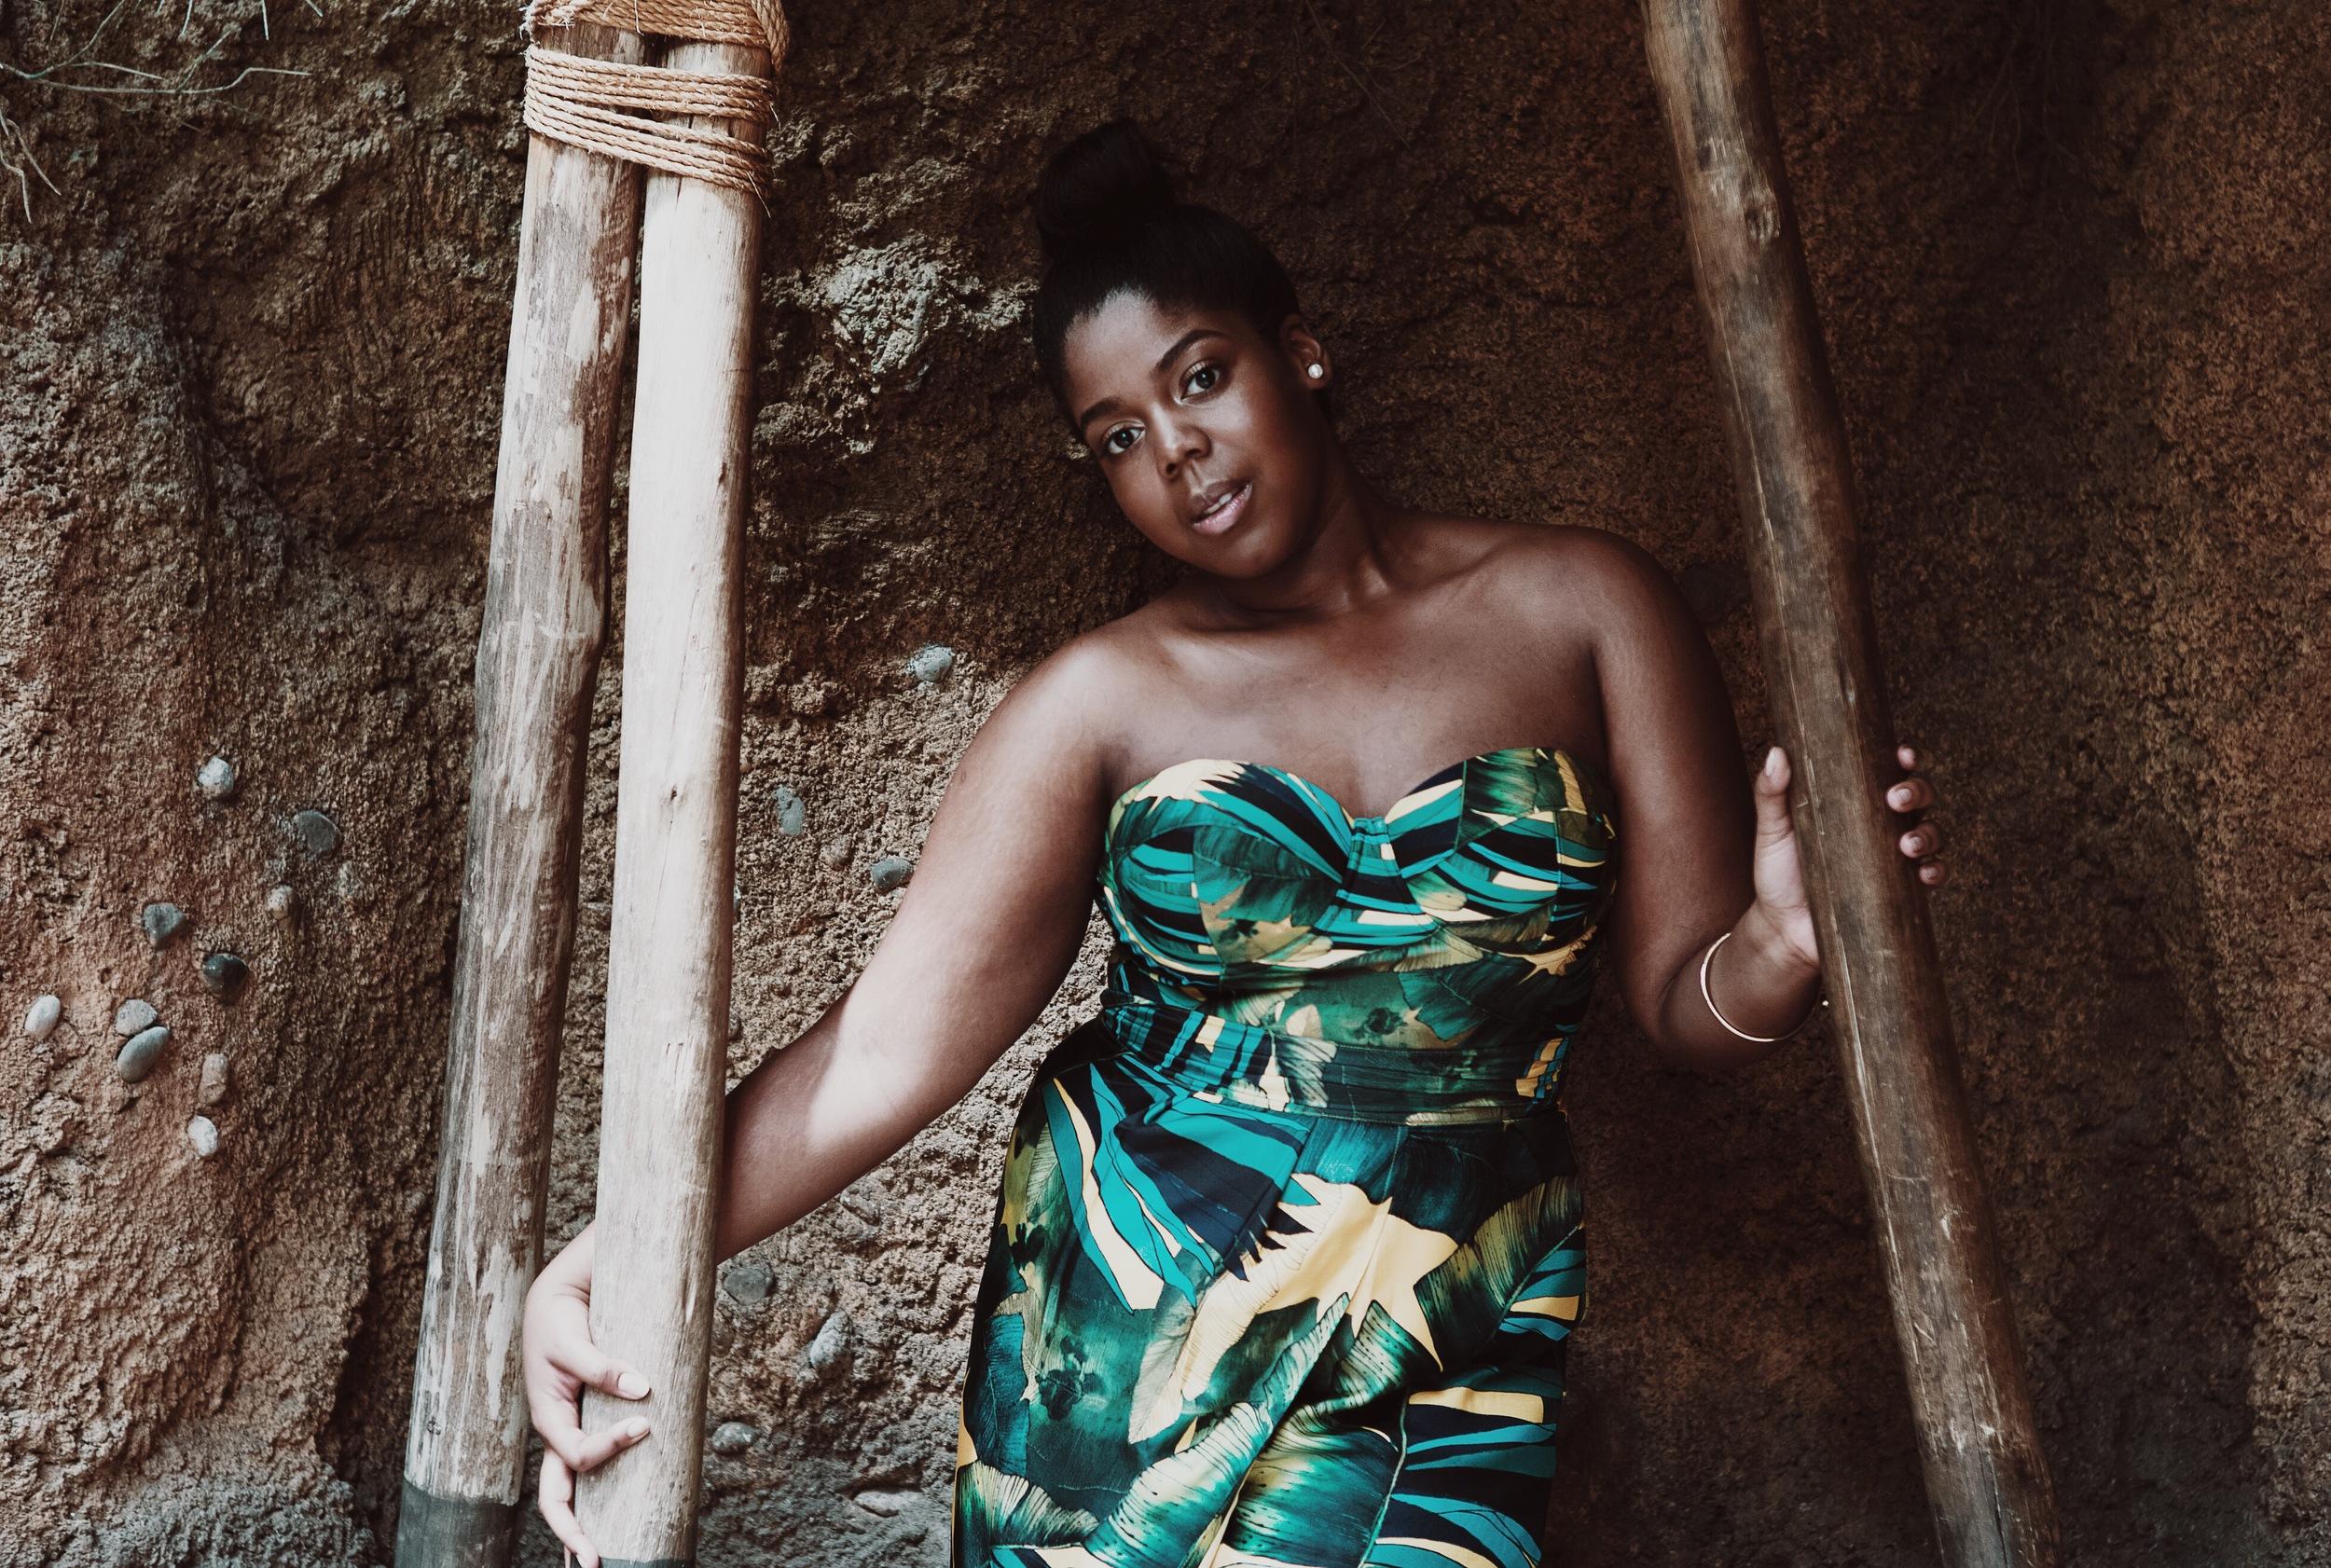 Jcrew Jungle Print Swimsuit Faux Tulip Wrap Skirt Double strap Heel Sandals Ikat Print Plus size Blogger Orne Jewelry Ghana THat Hayet Rida 1.jpeg